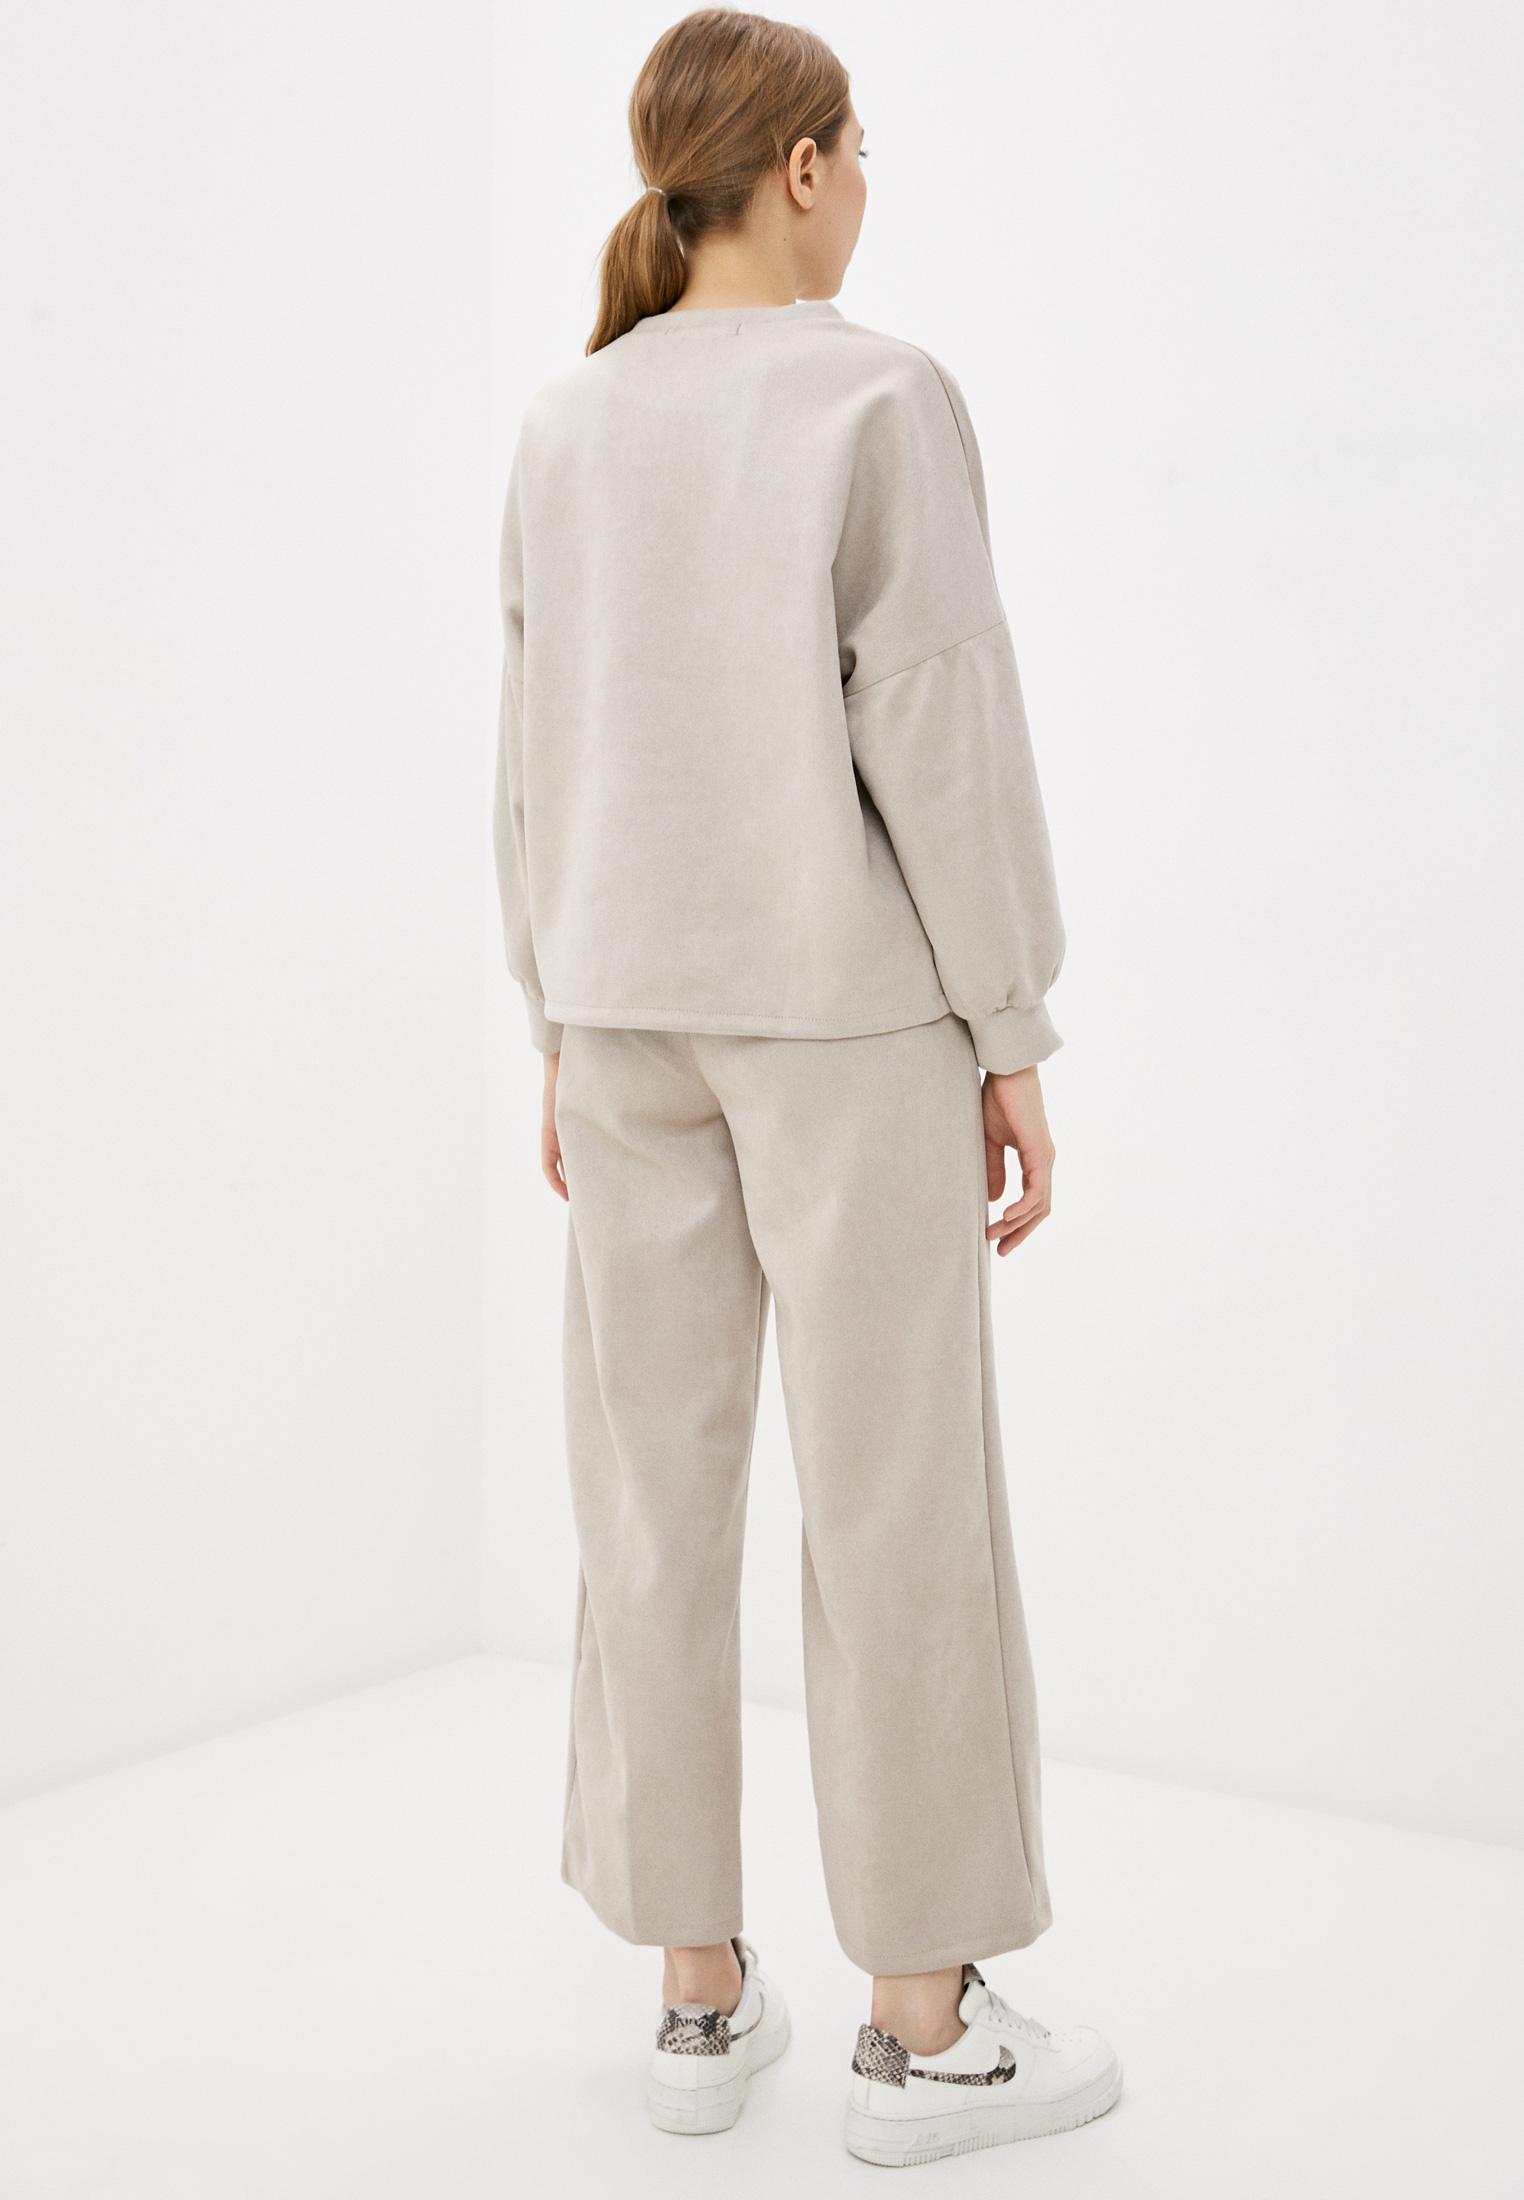 Костюм с брюками Nerouge N1254-1: изображение 3